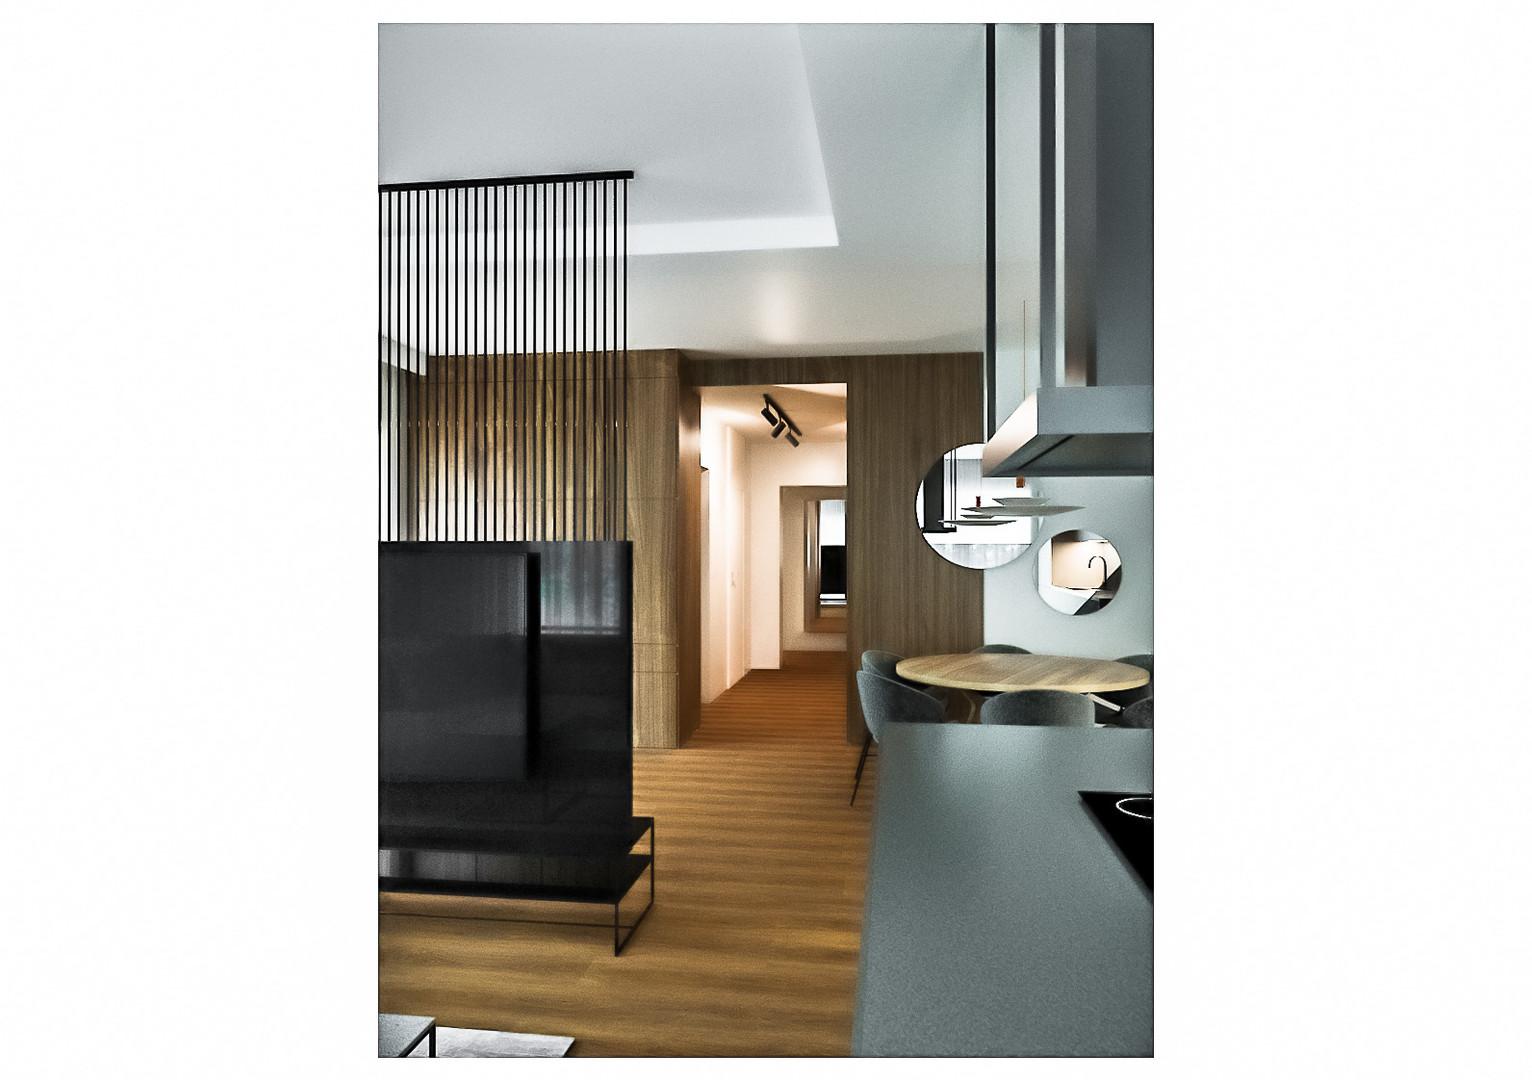 Poznan 3 bedroom for rent-6.jpg